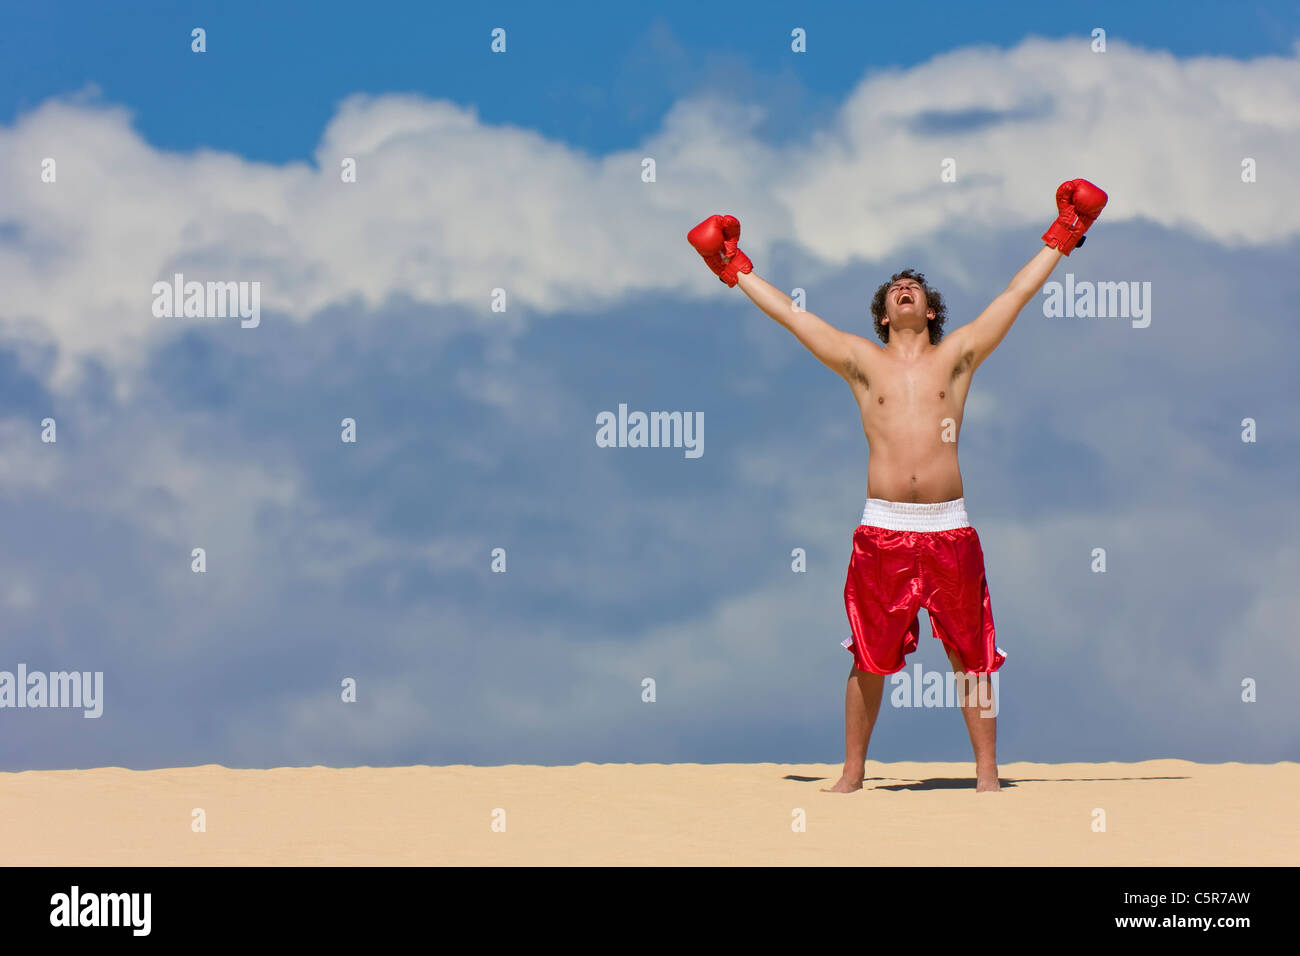 Boxer feiert am Anfang der Welt. Stockbild